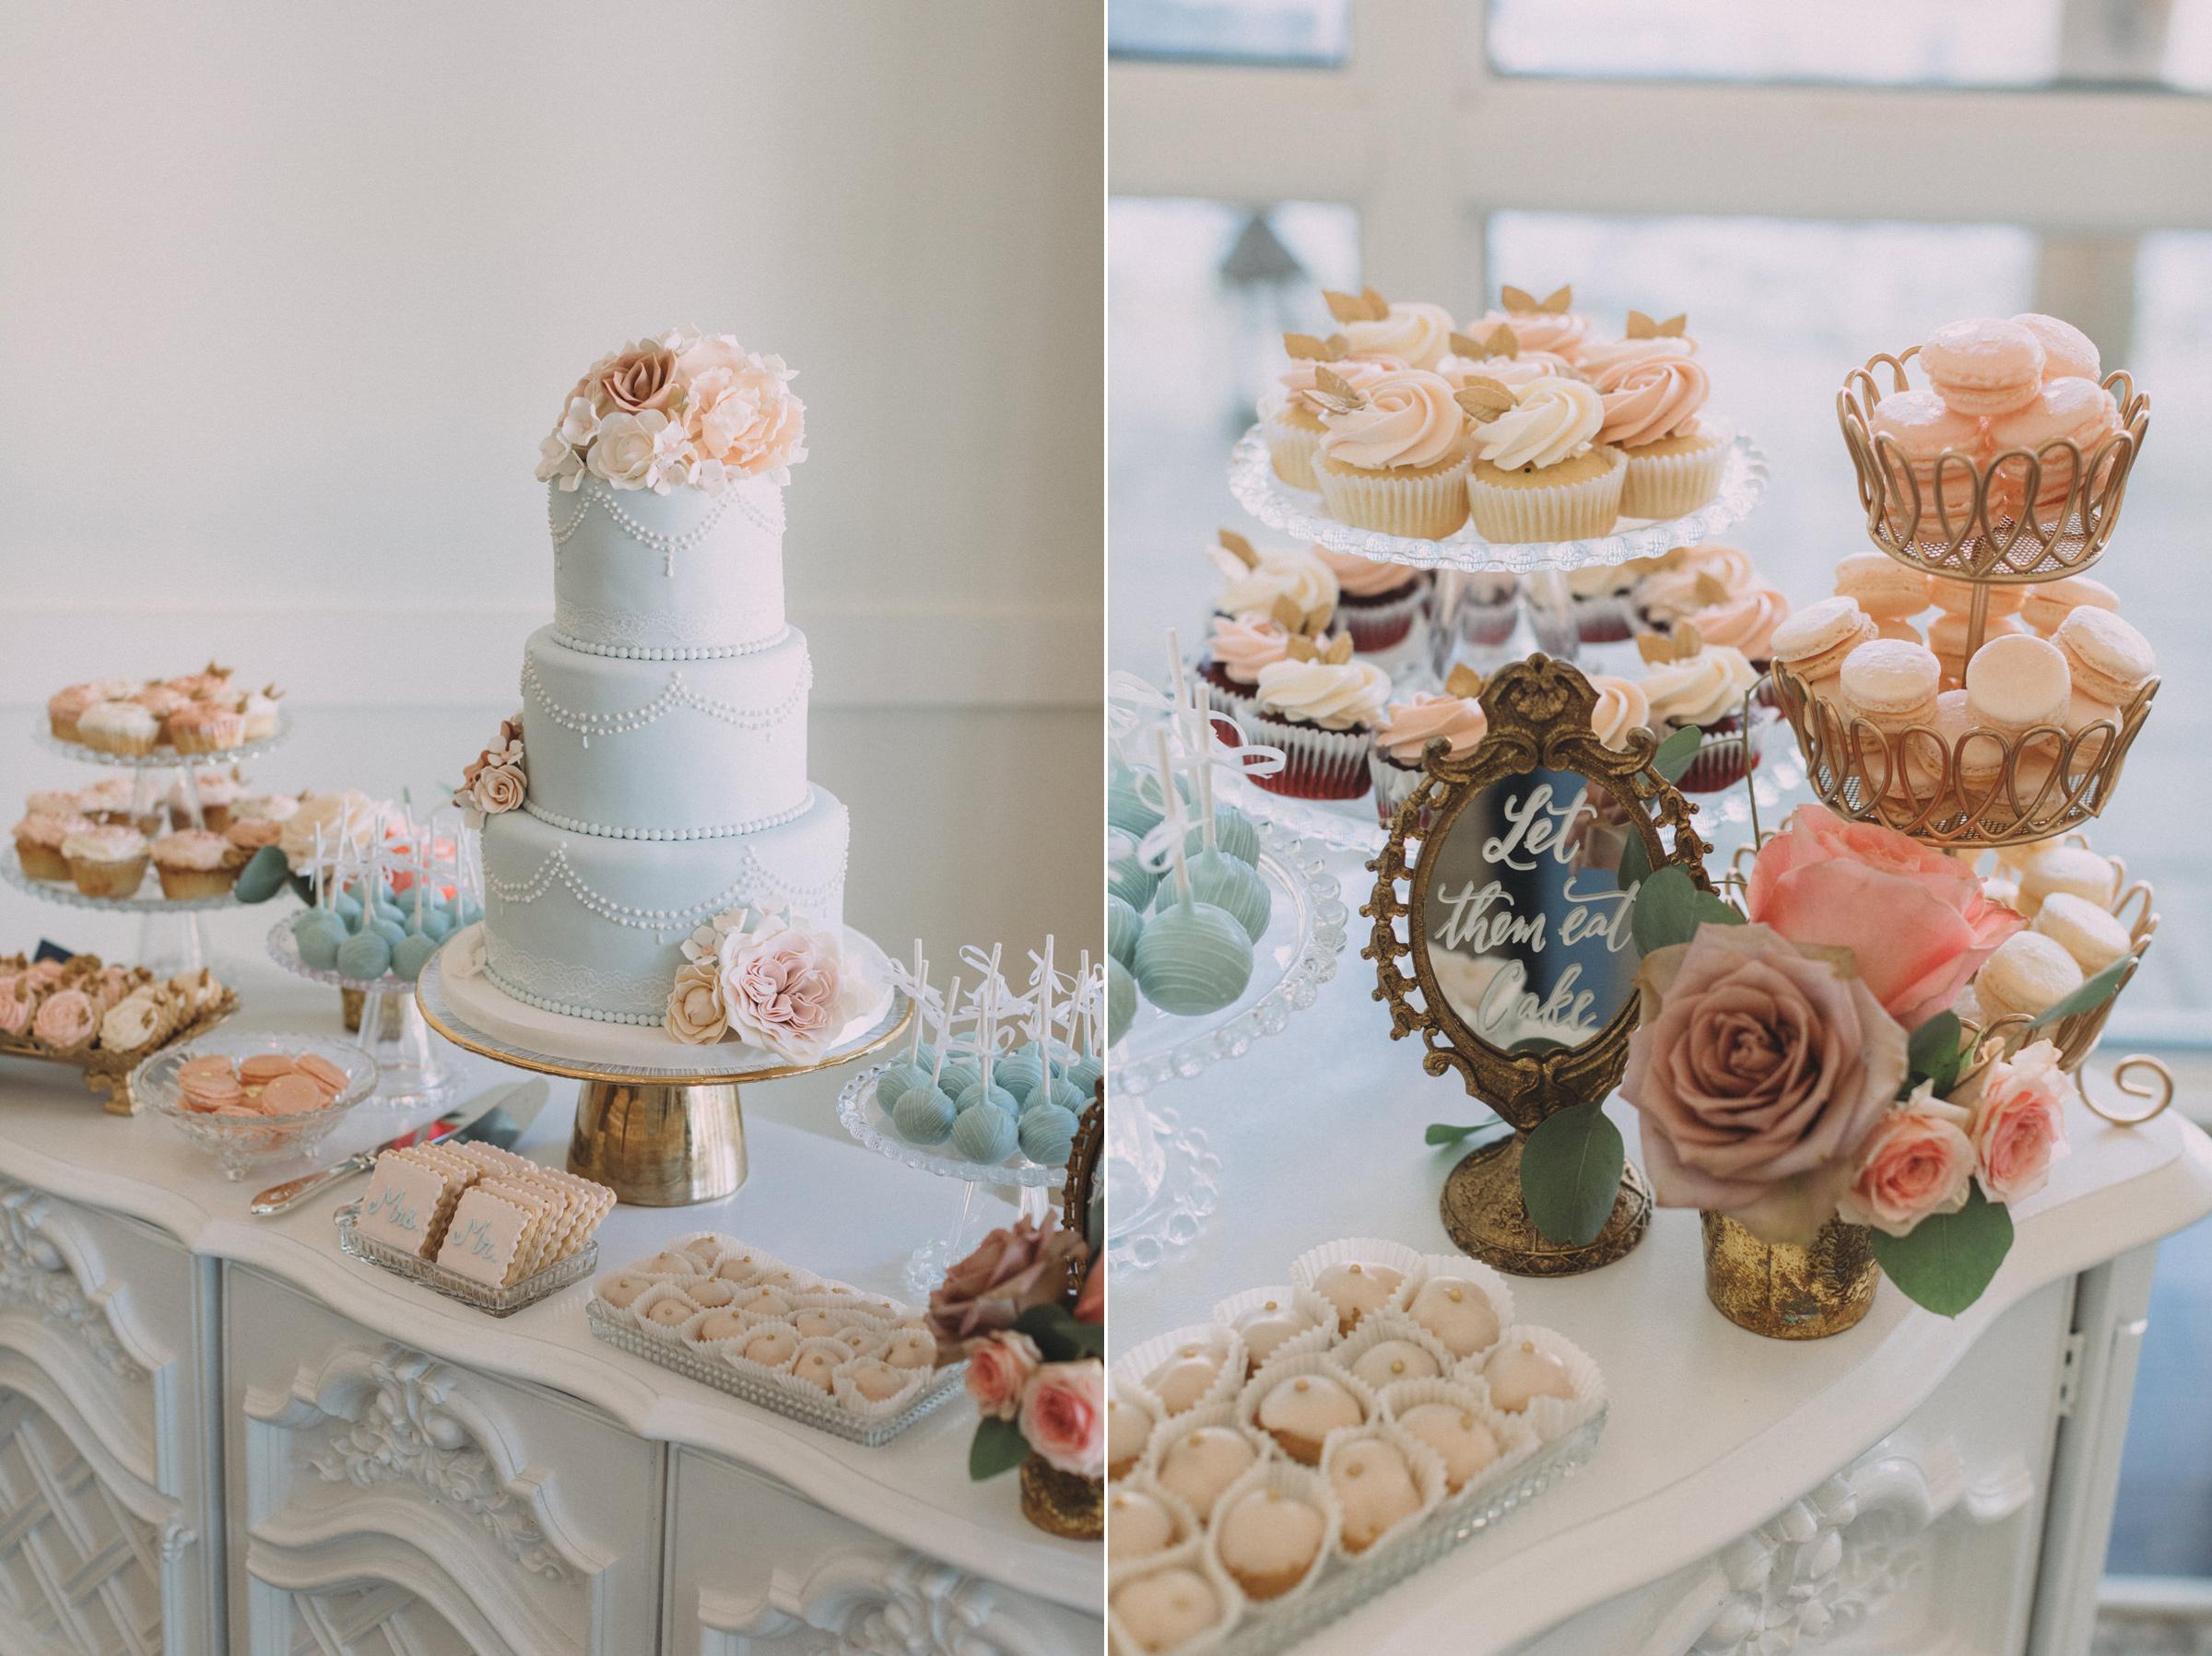 Langdon-Hall-wedding-photography-Cambridge-by-Sam-Wong-of-Visual-Cravings_Sarah-Ryan_45.jpg